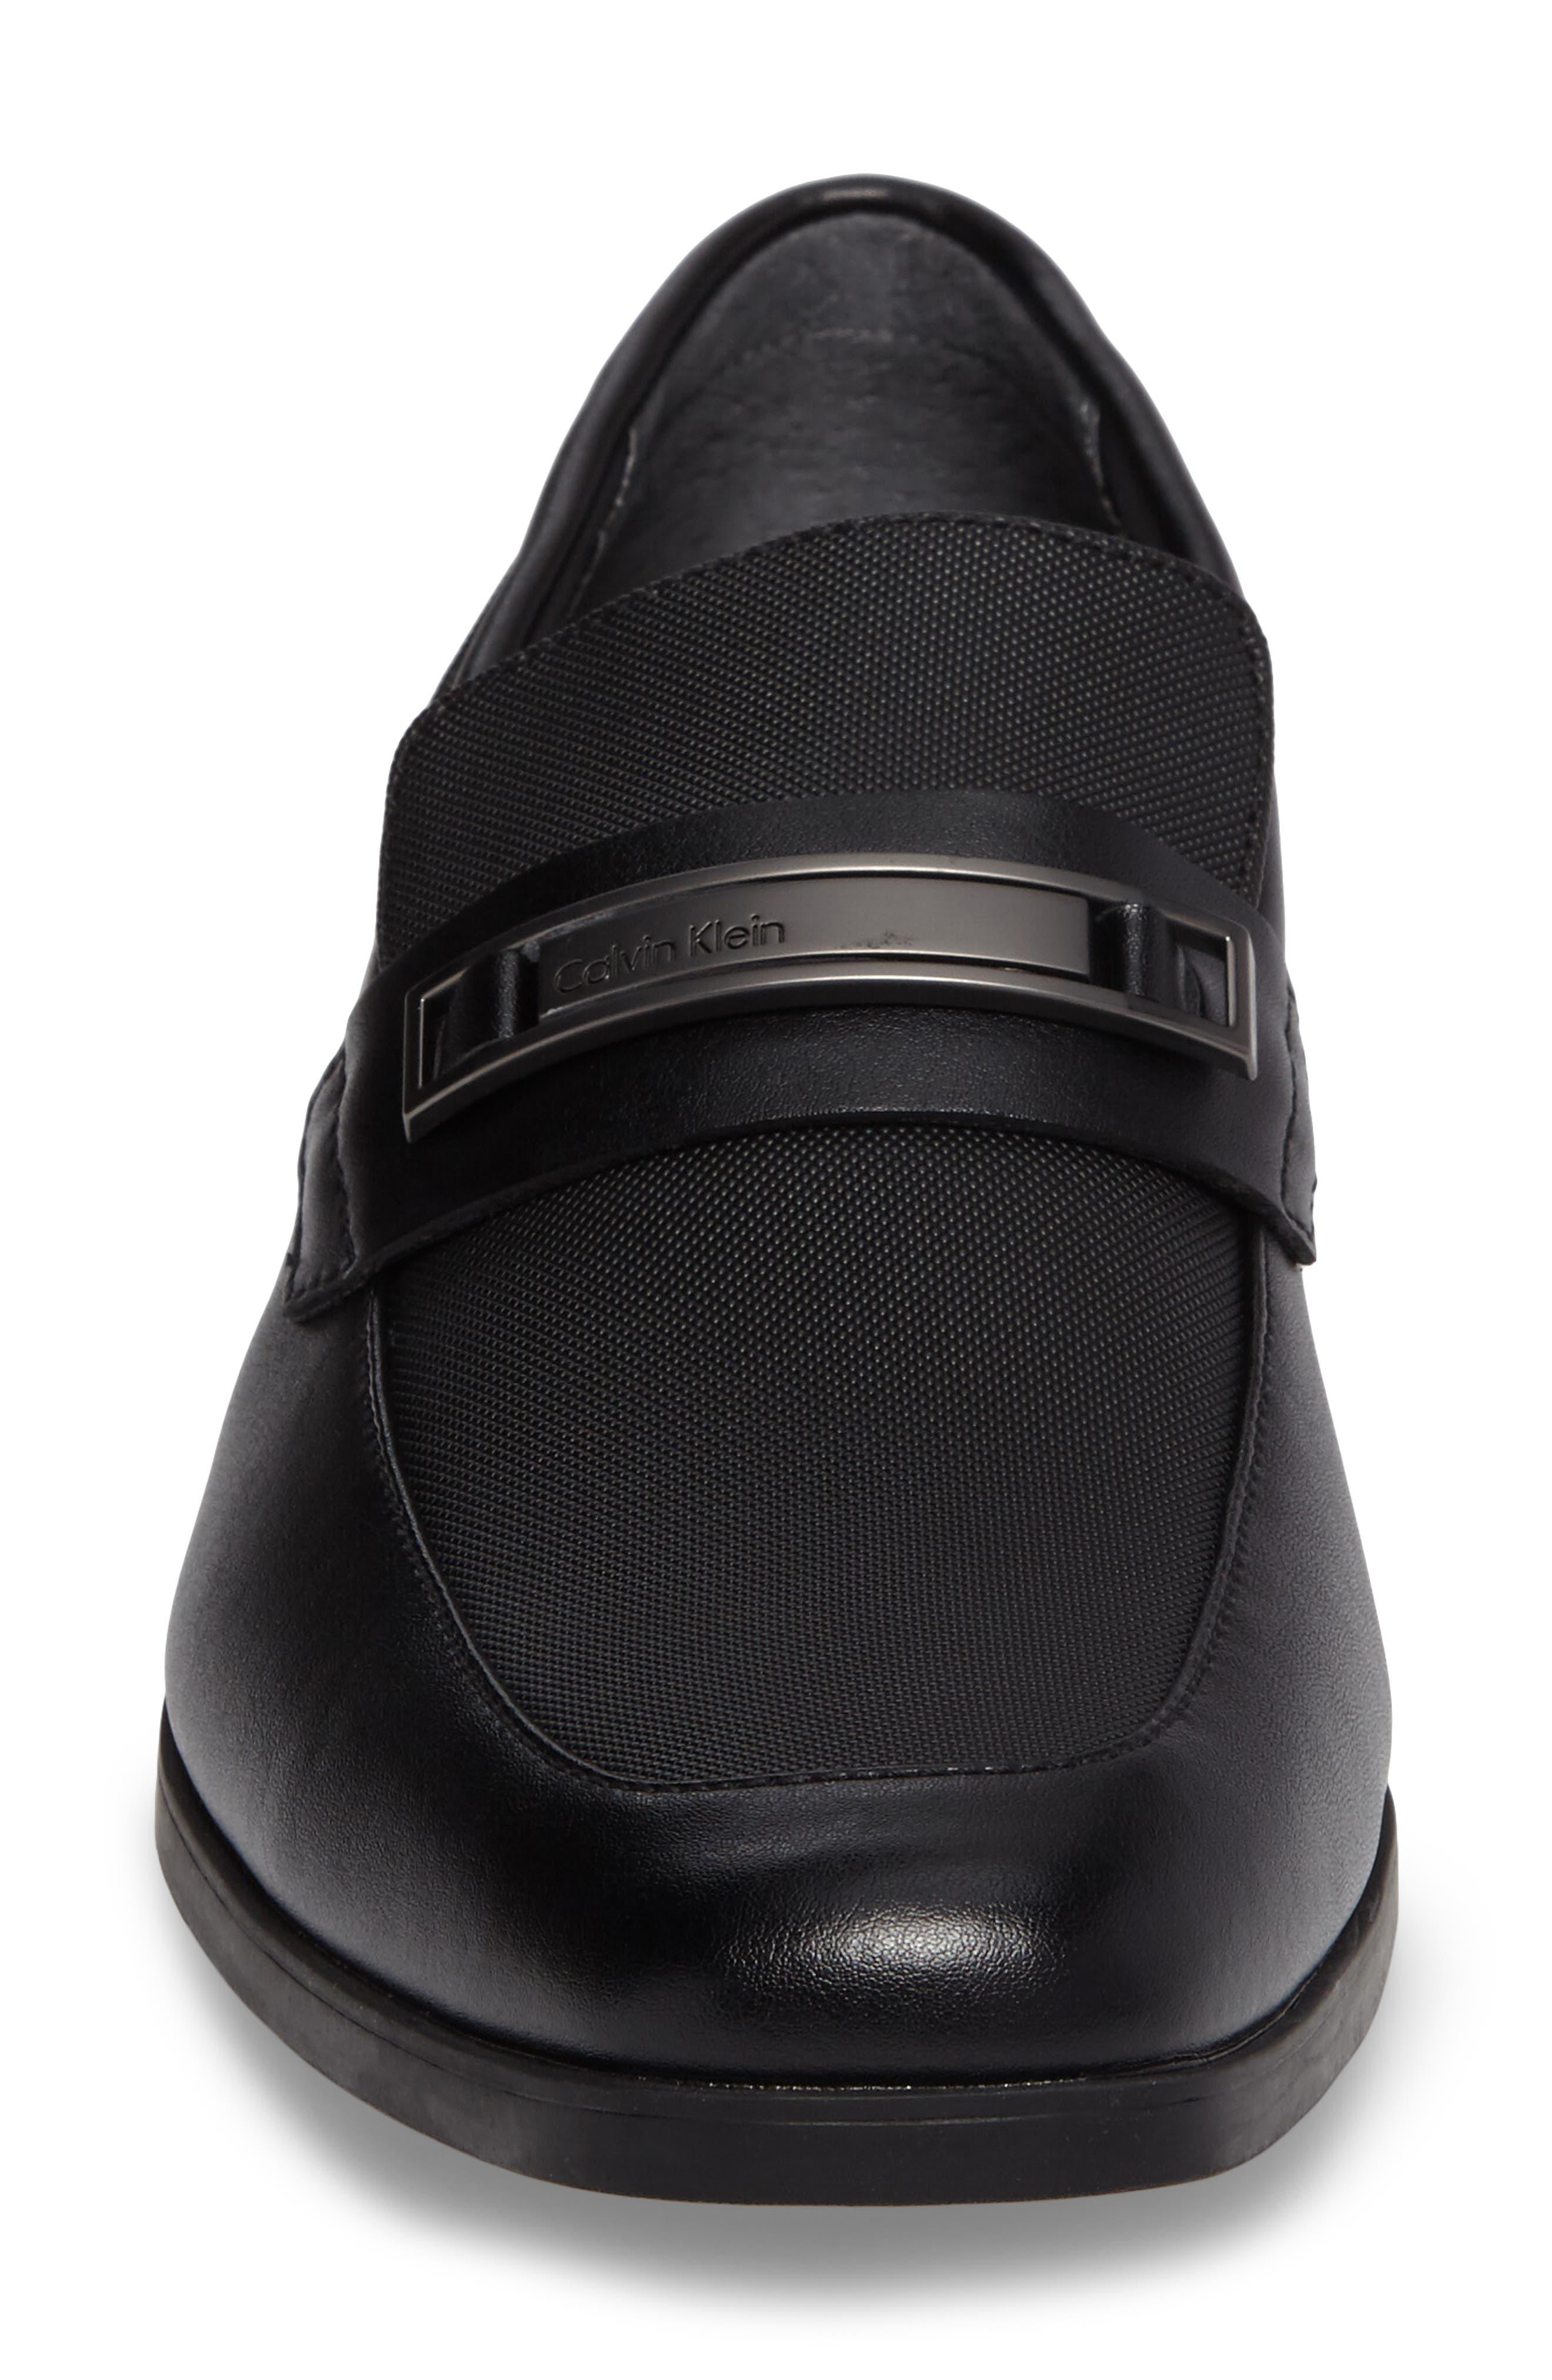 Jameson Emossed Loafer,                             Alternate thumbnail 4, color,                             BLACK LEATHER